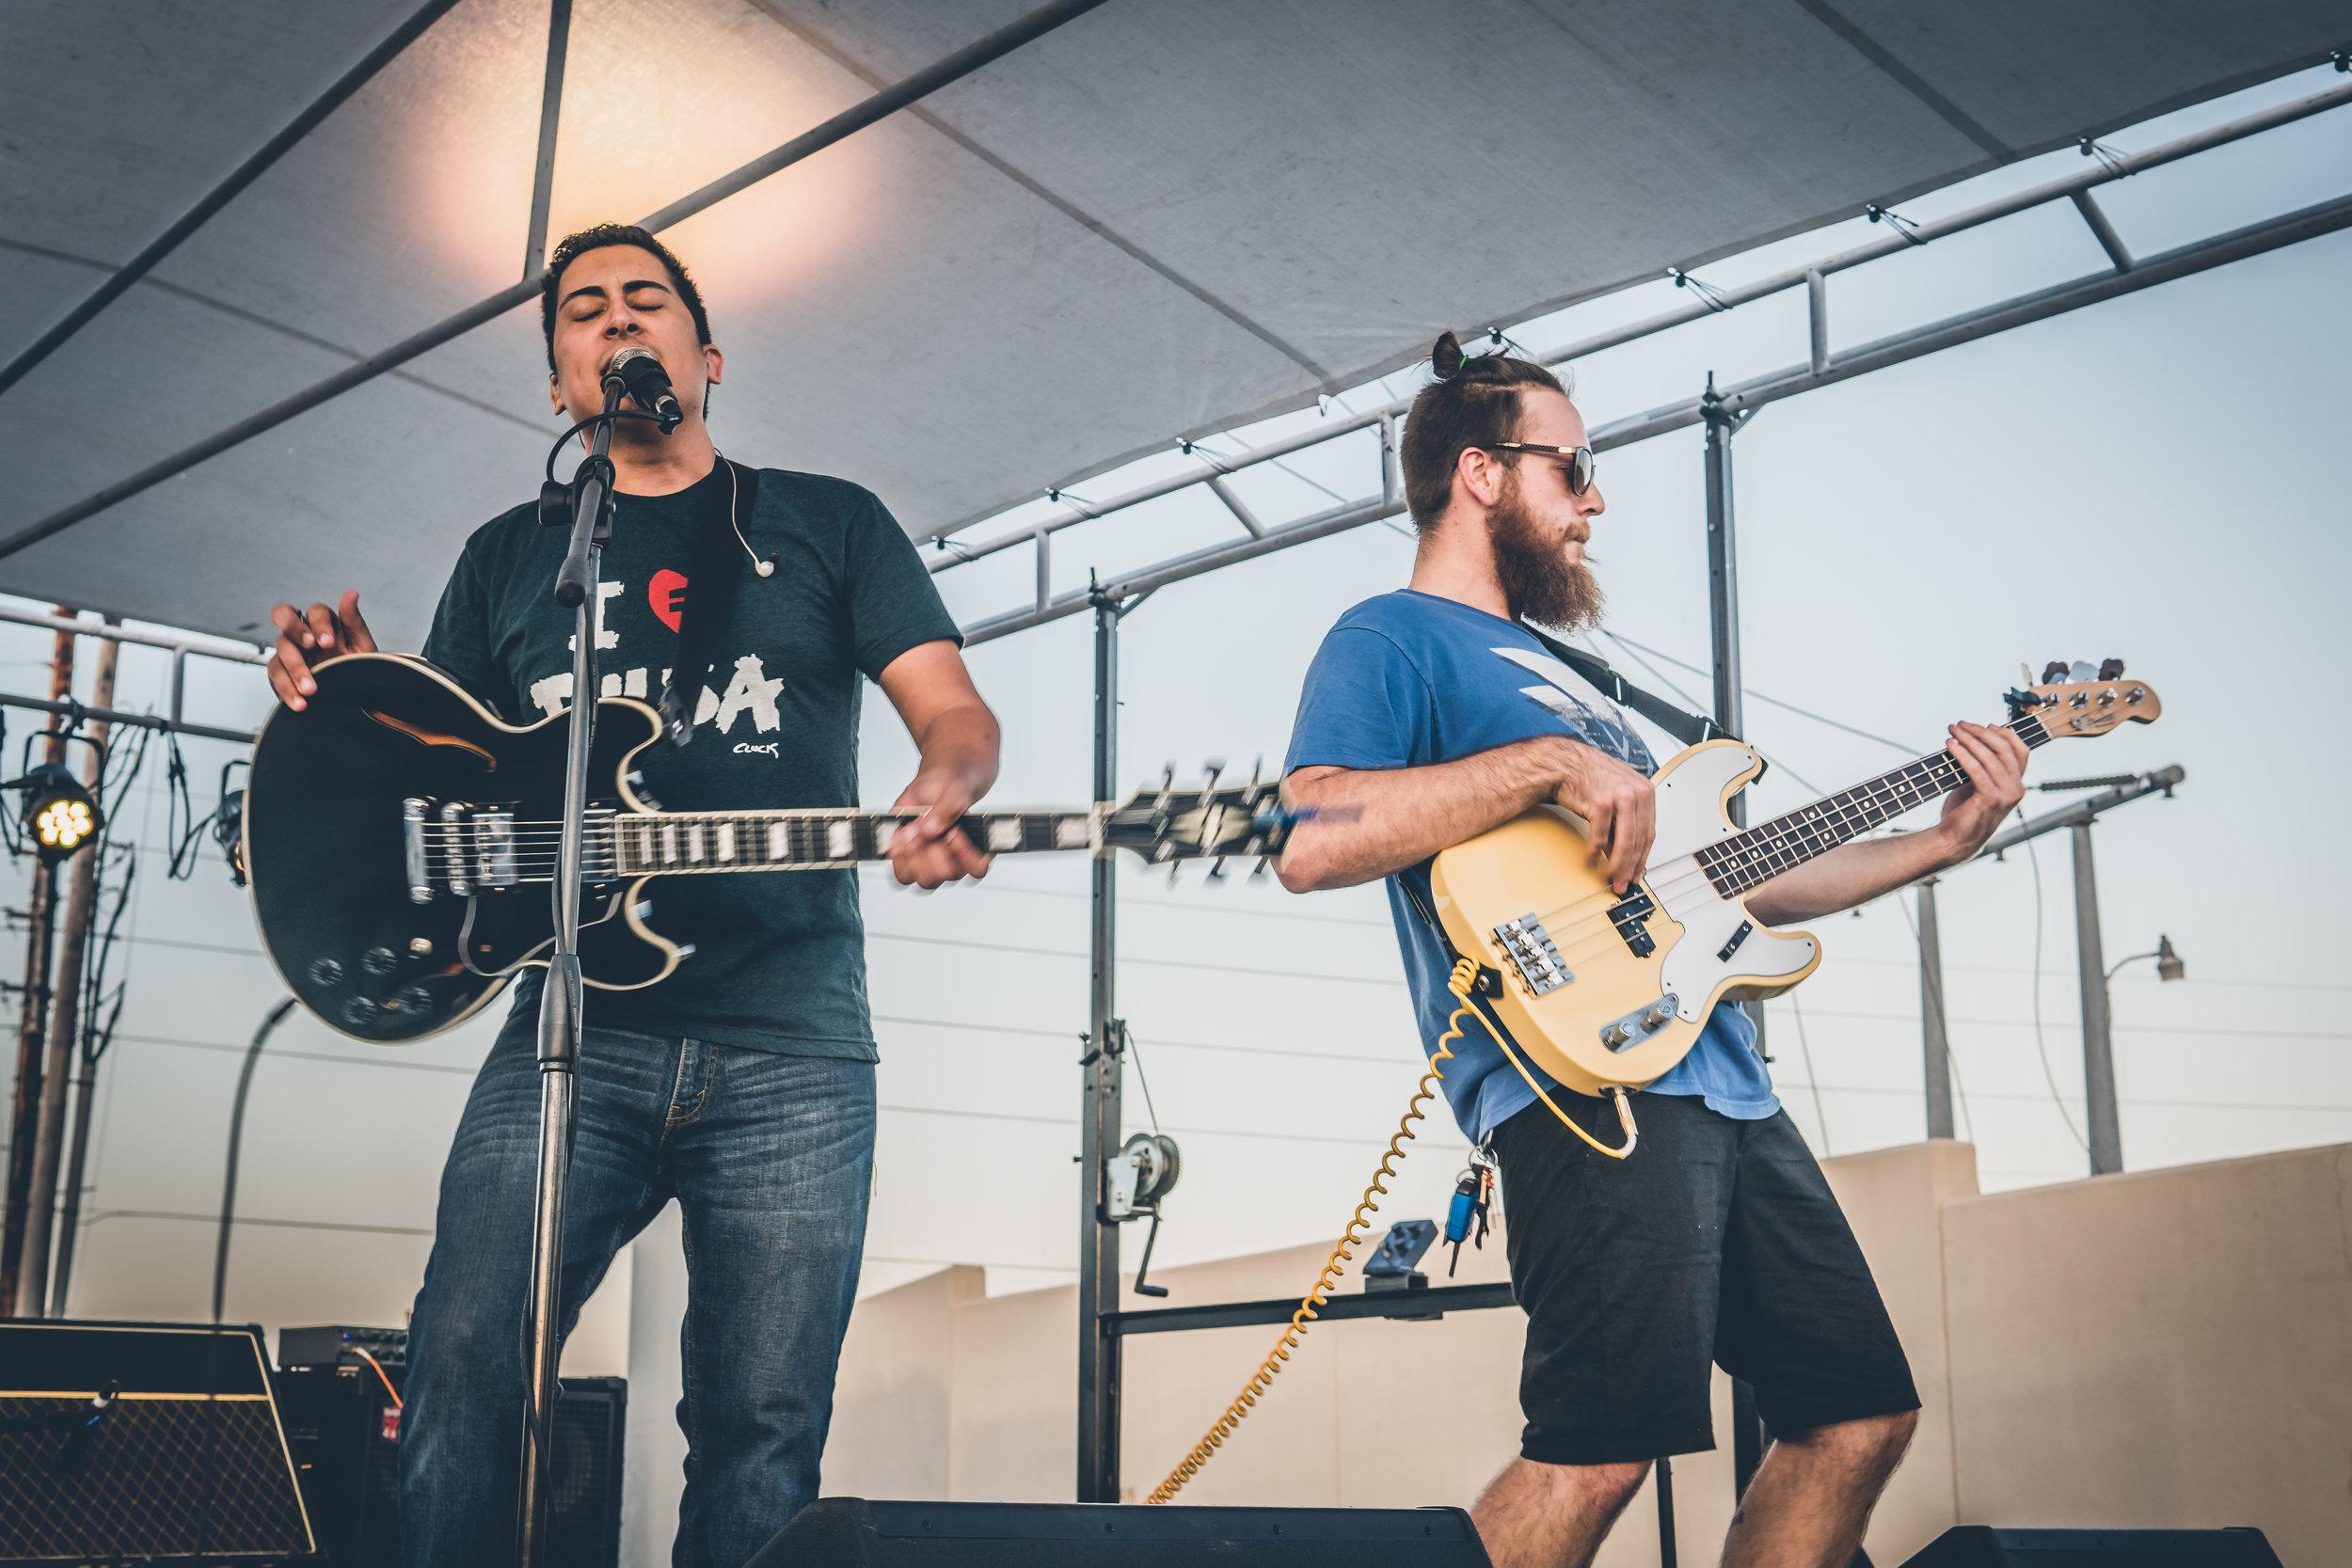 FM Pilots - Tulsa Rock Band - Tulsa Pride Fest Tulsa, OK 060416-17.jpg